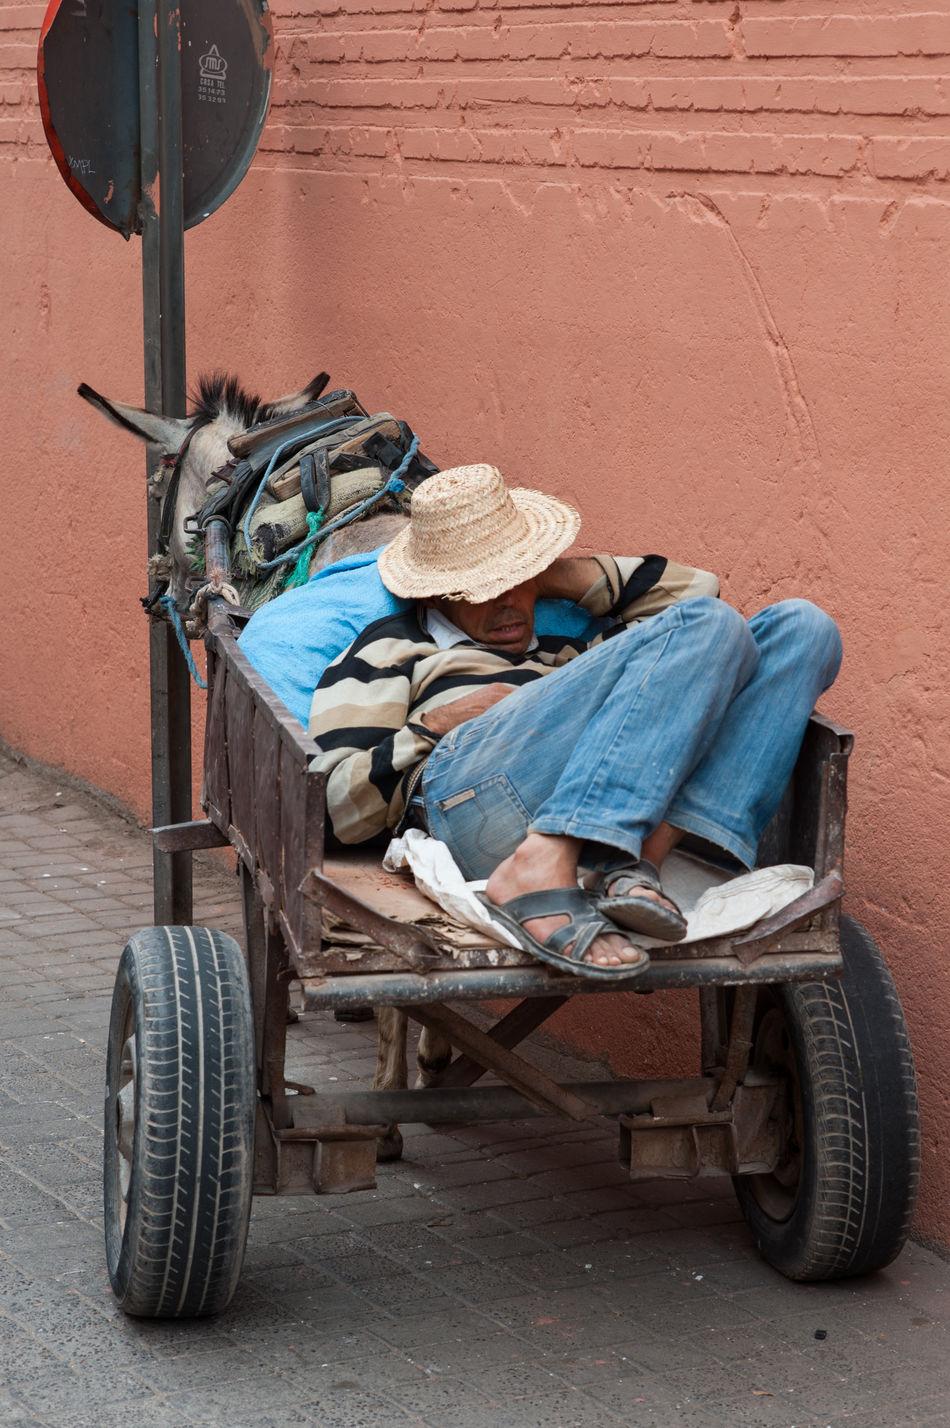 Taking a nap Asleep Candid City Day Donkey Hat Medina Outdoors Sleep Sleeping Streetcandid Streetphotography Transportation